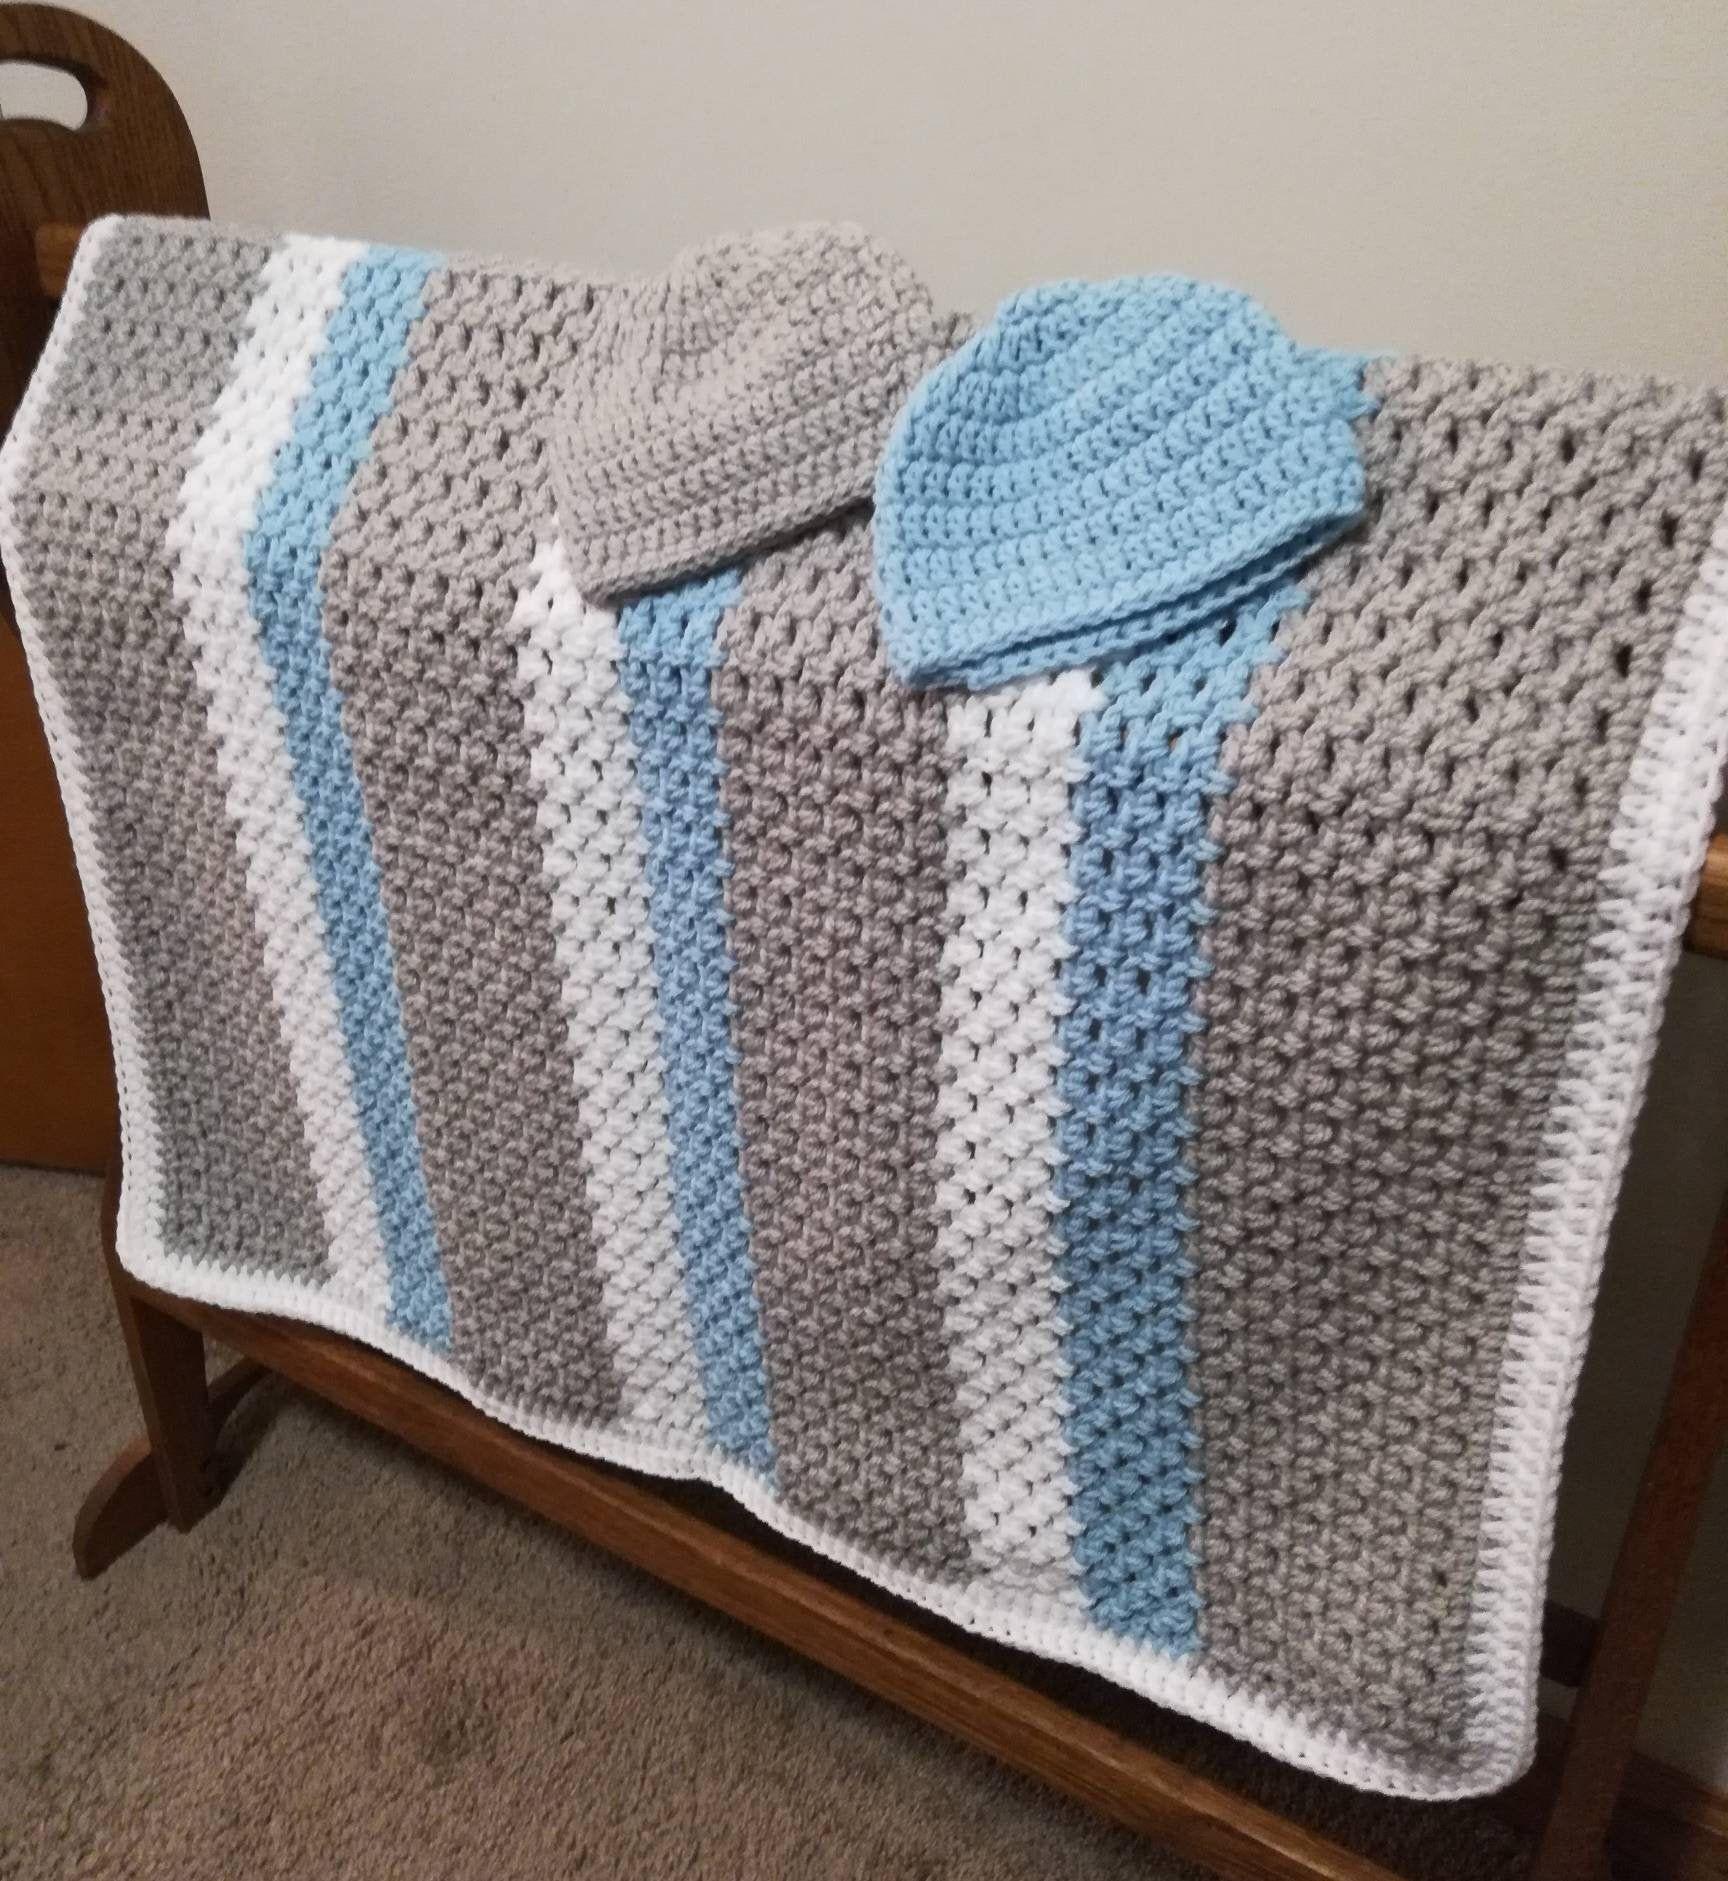 Crochet newborn afghan Blue gray baby blanket hat set Deluxe newborn boy gift Handmade baby booties        A20 Infant hat slipper set